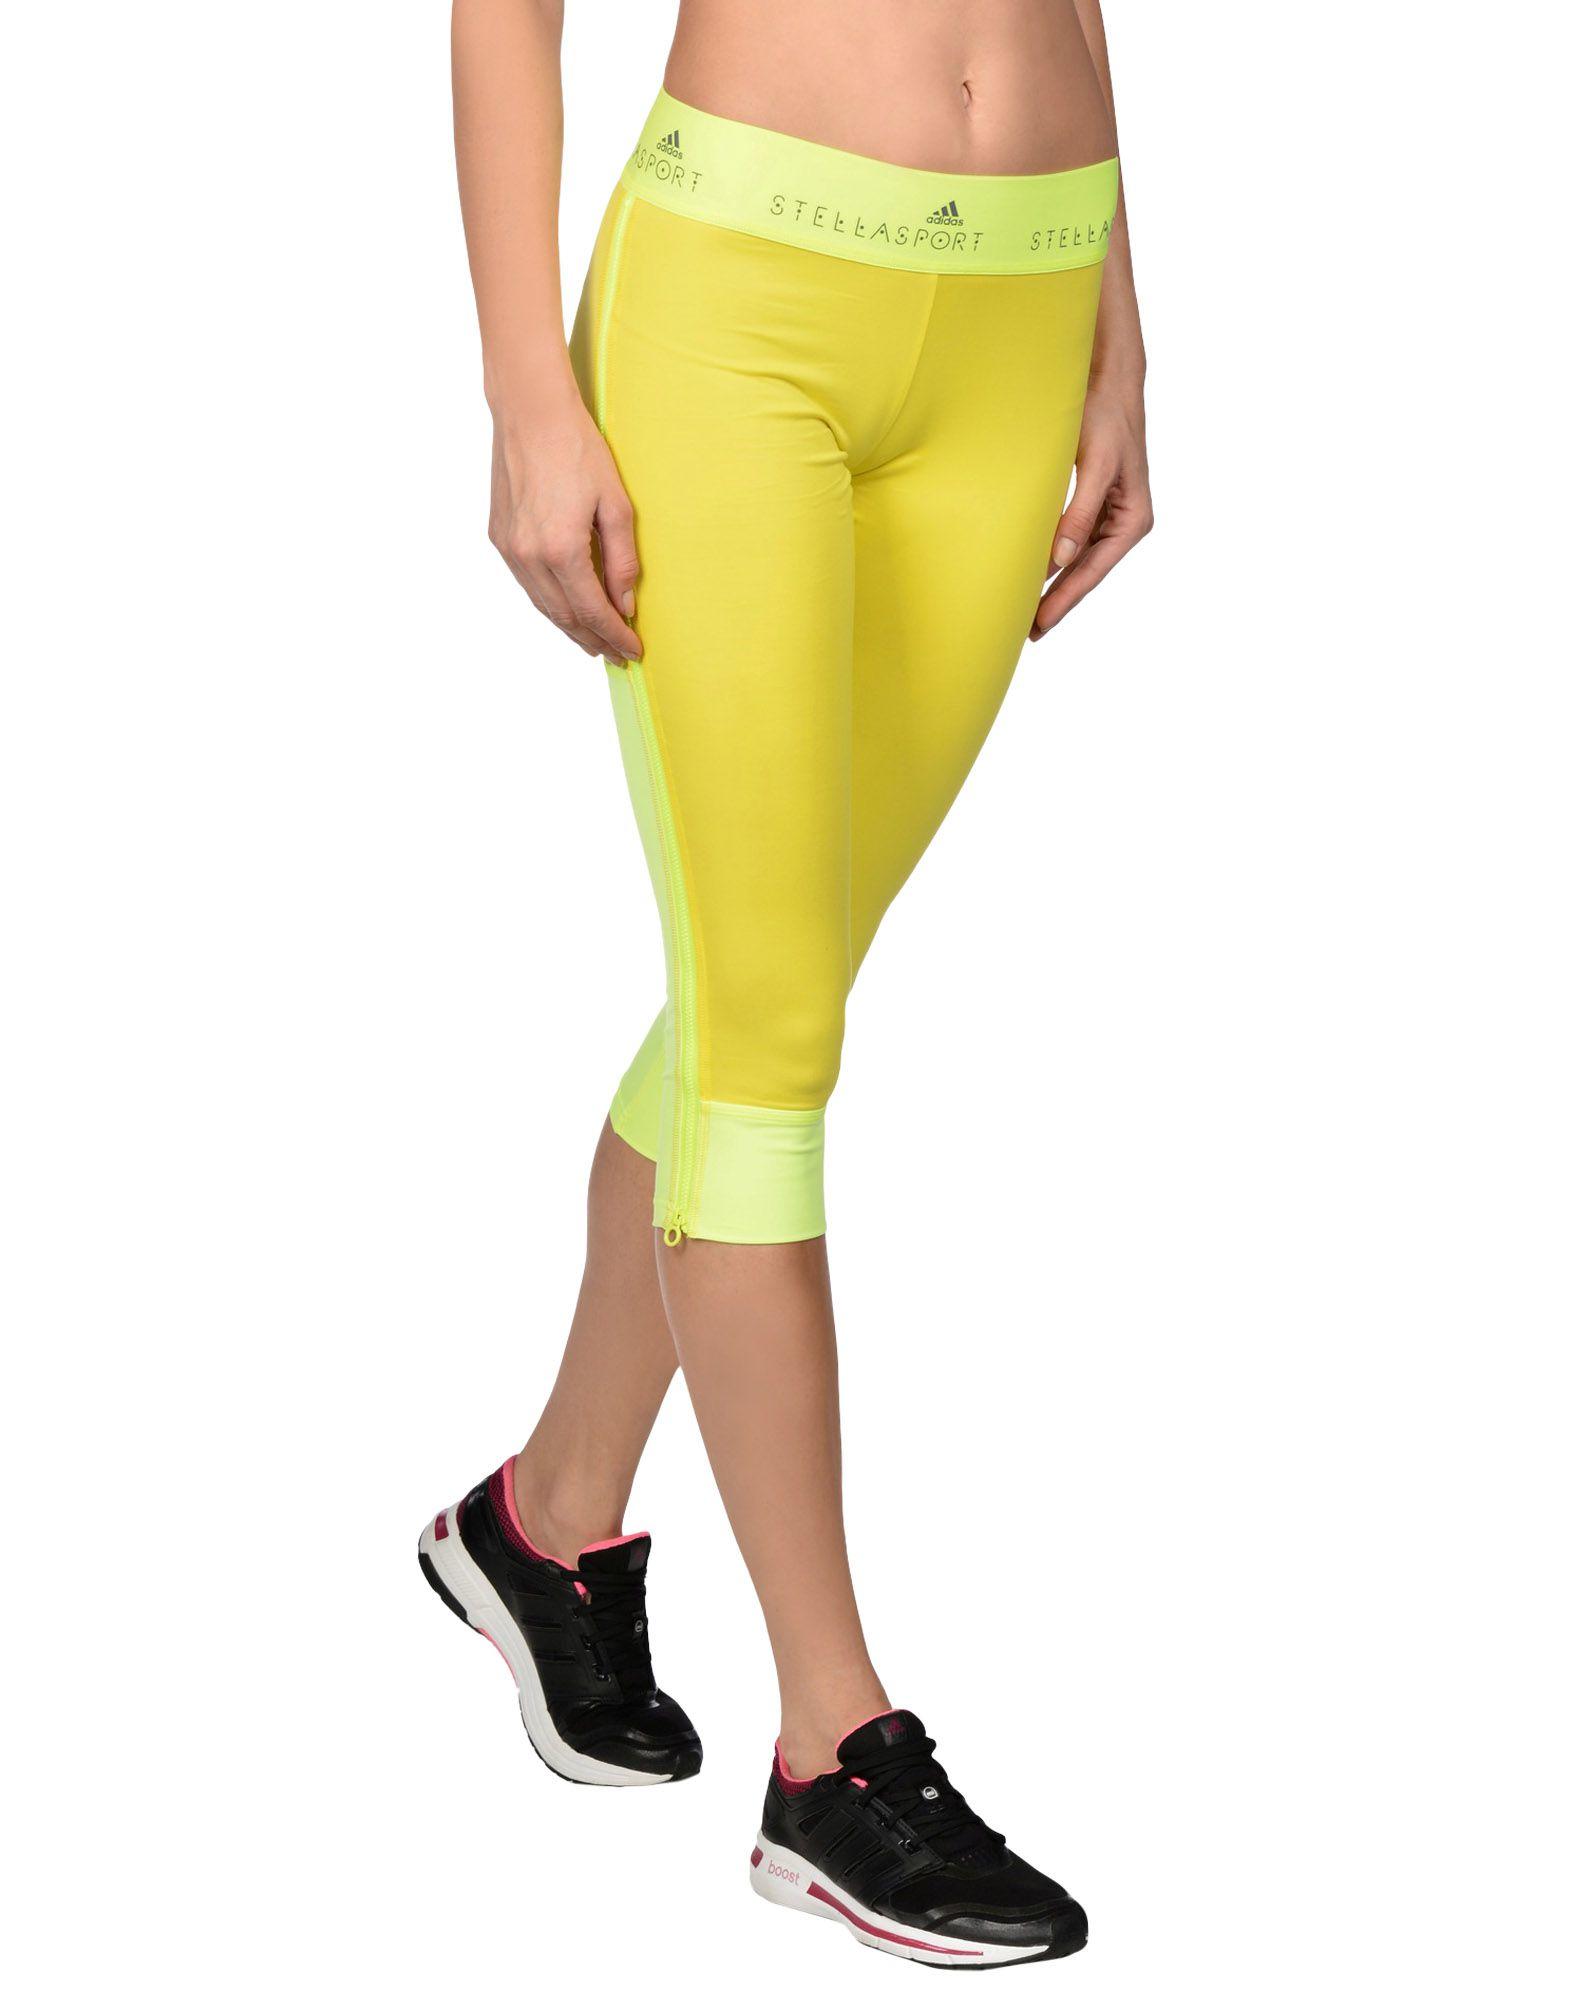 adidas by stella mccartney leggings in green lyst. Black Bedroom Furniture Sets. Home Design Ideas